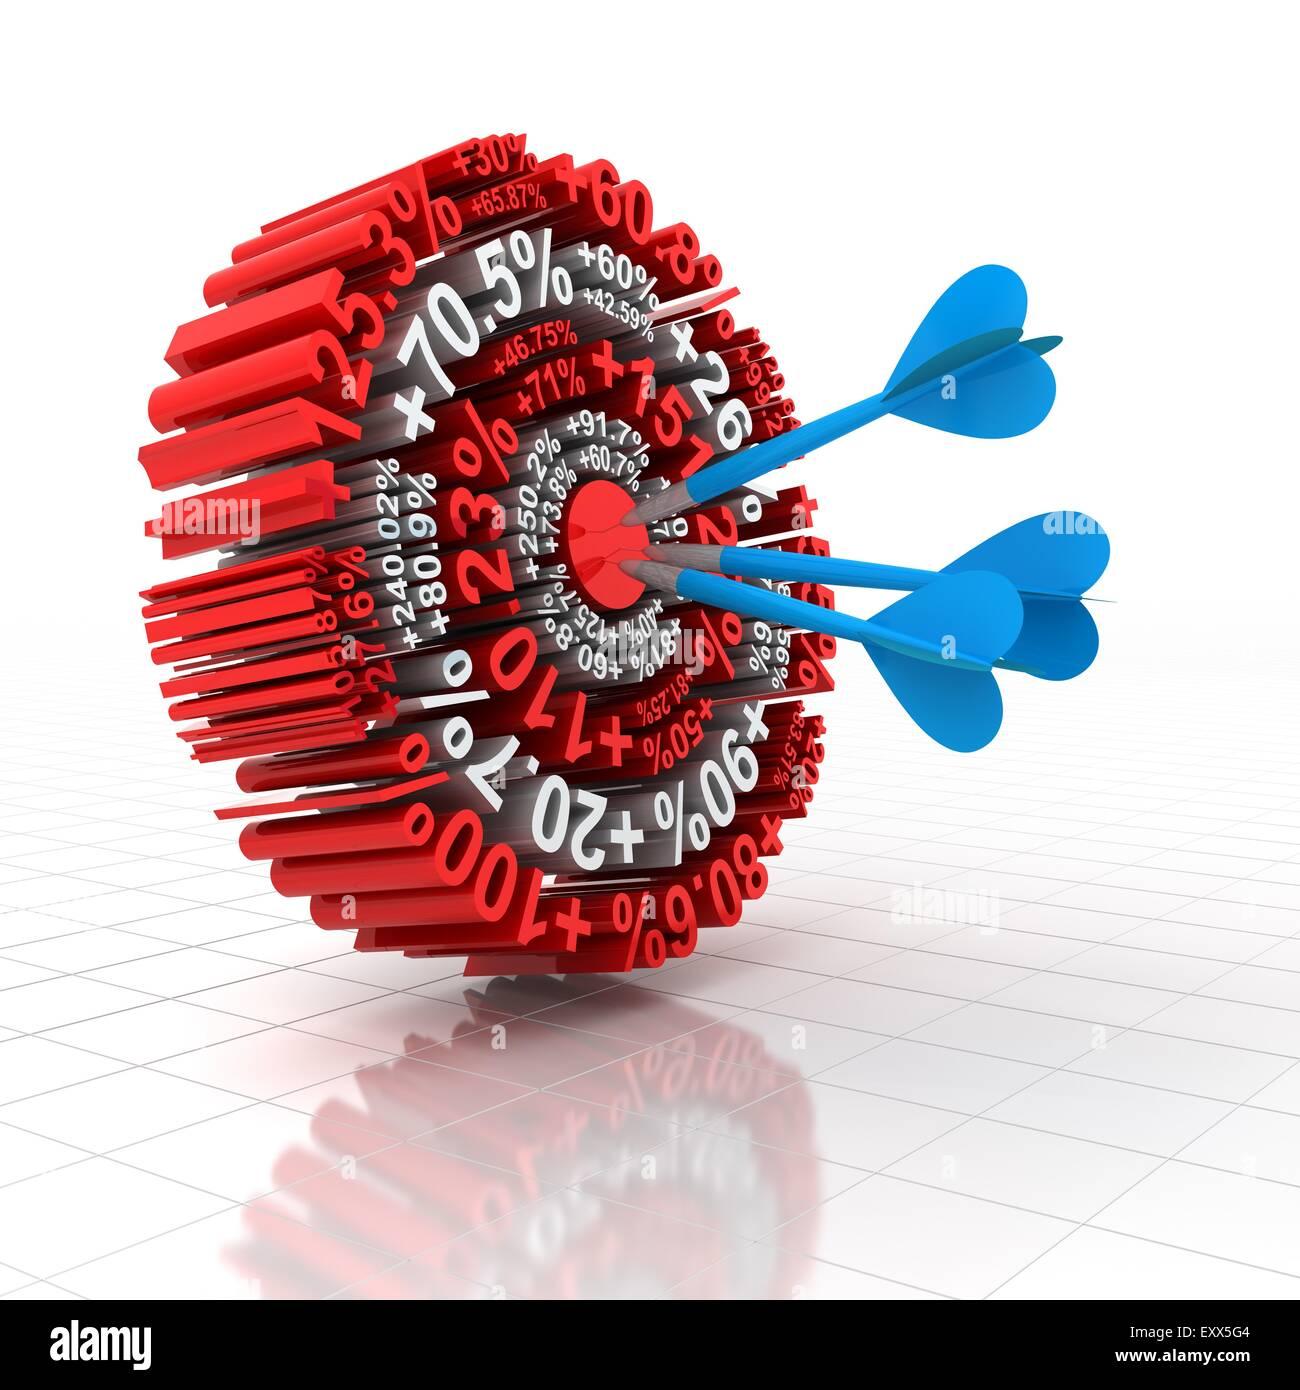 Financial target - Stock Image